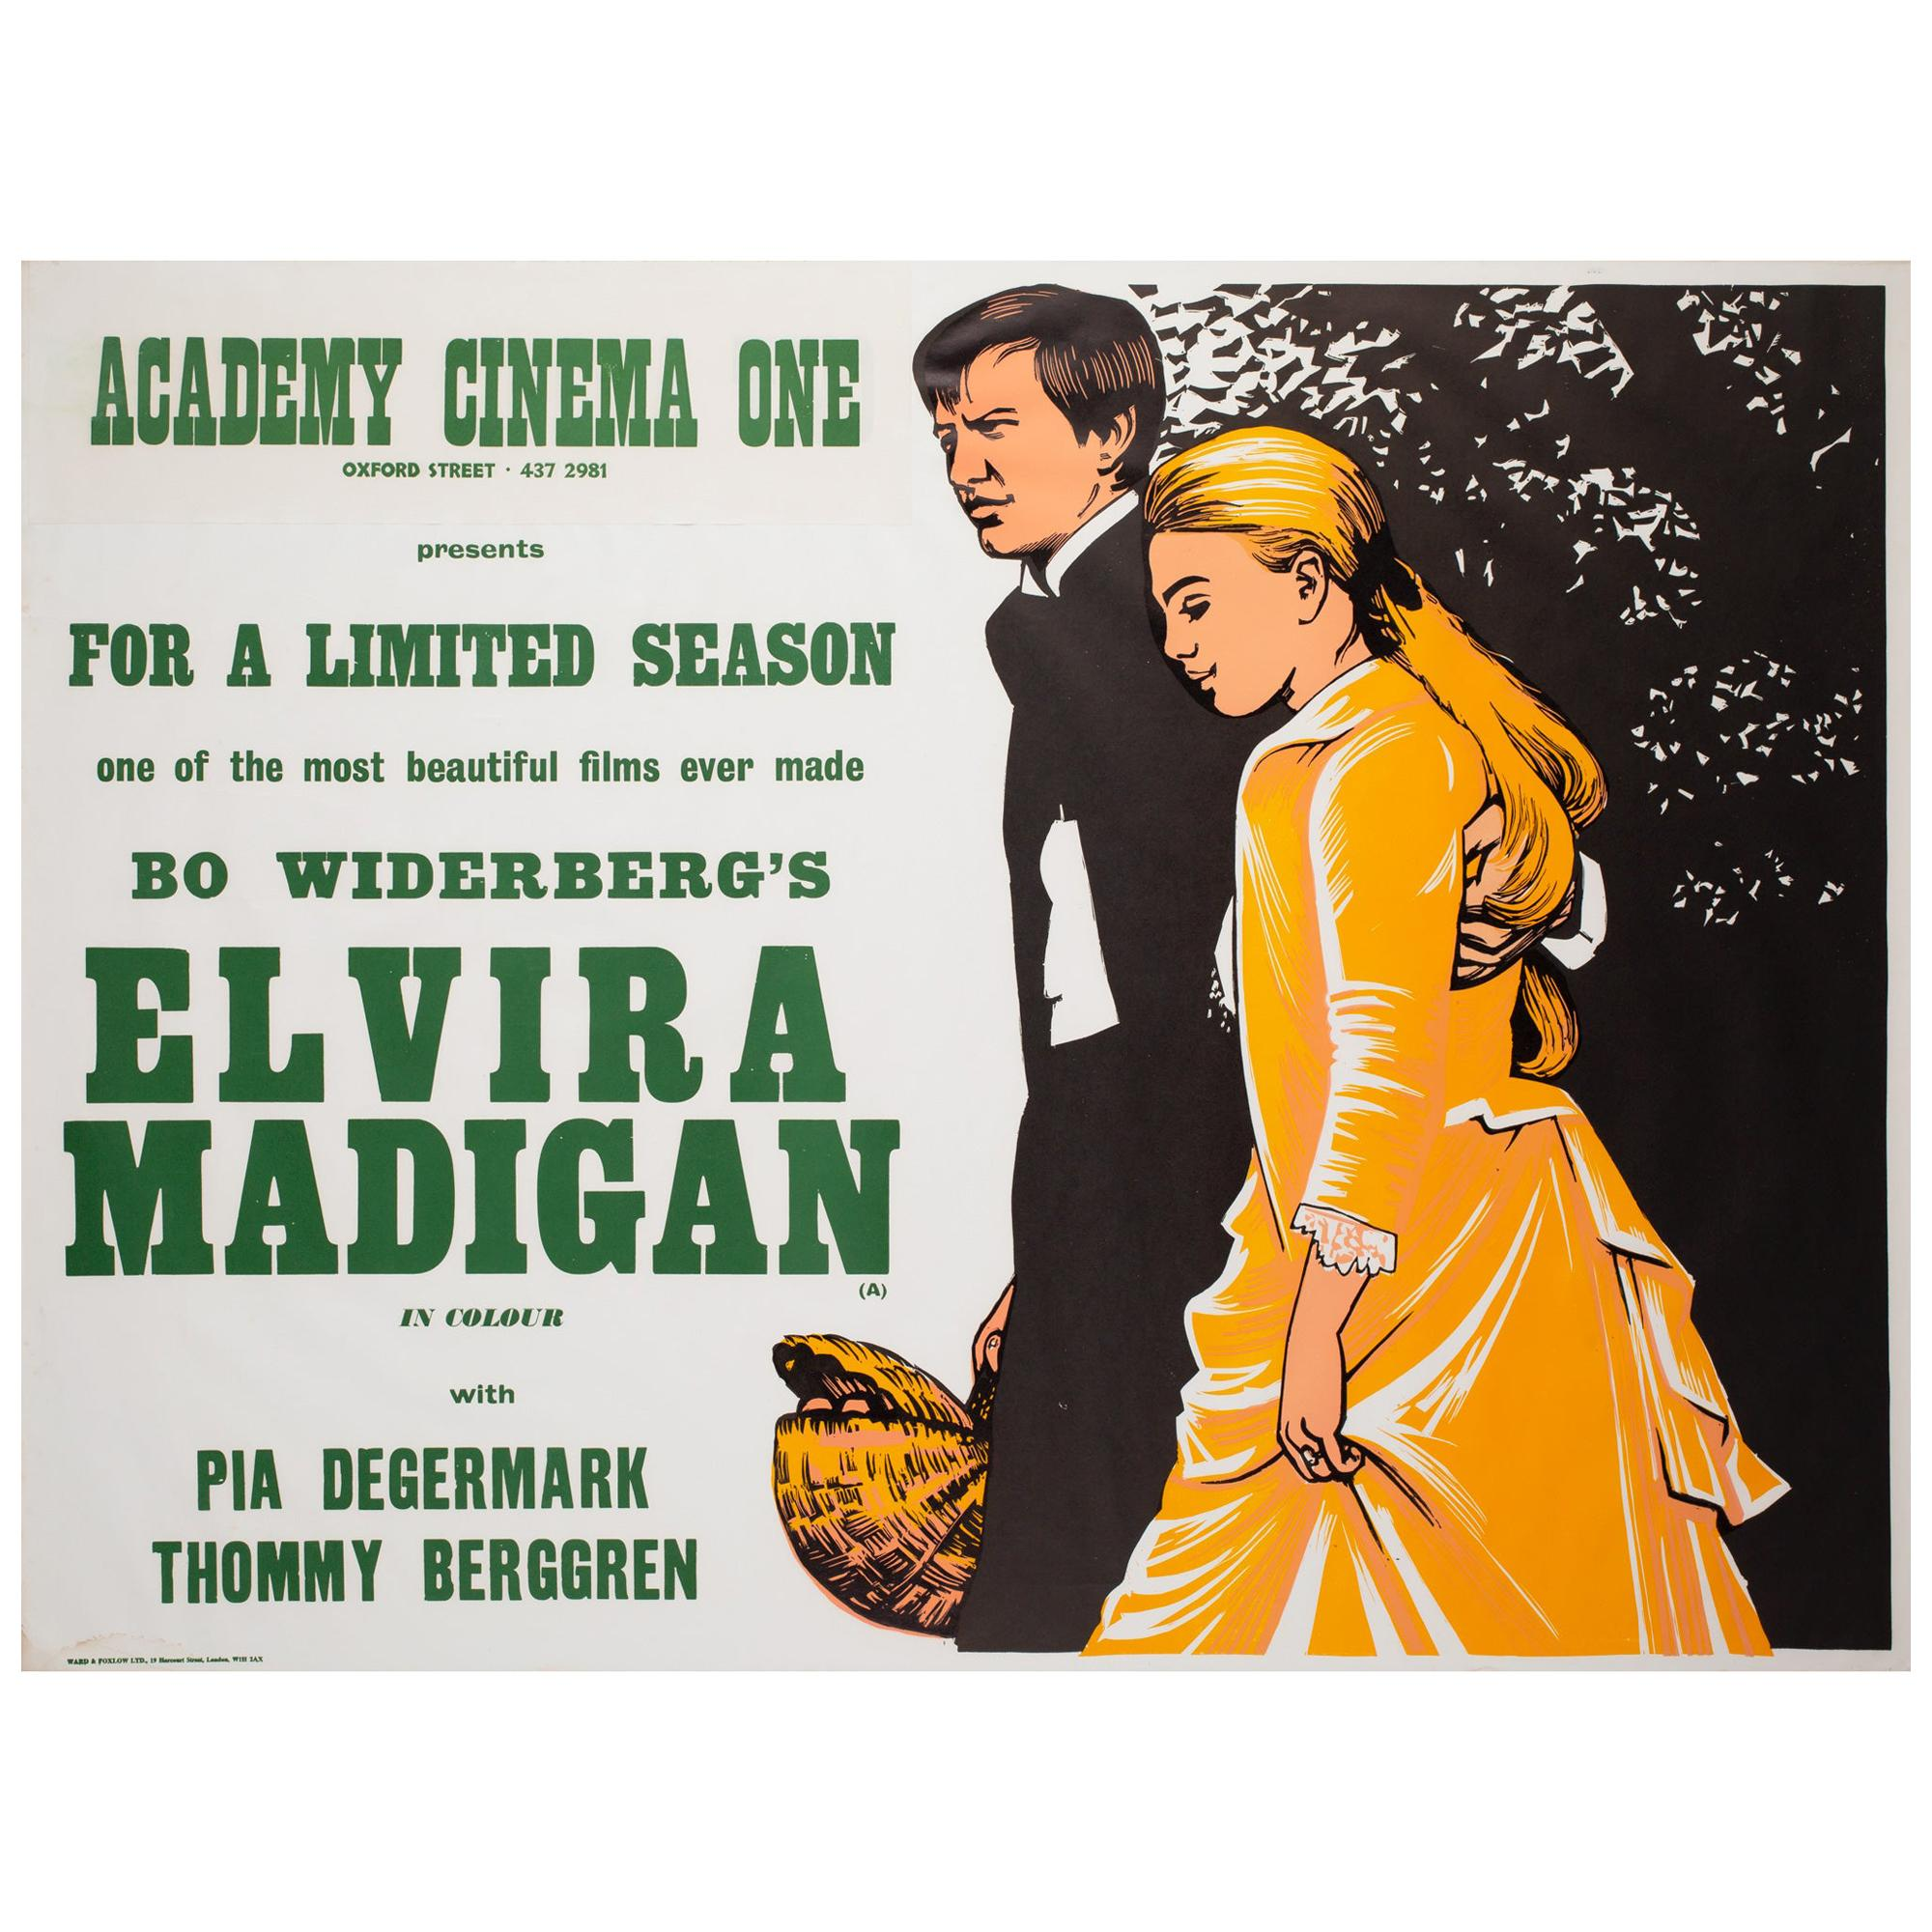 Elvira Madigan 1968 Academy Cinema UK Quad Film Movie Poster, Strausfeld